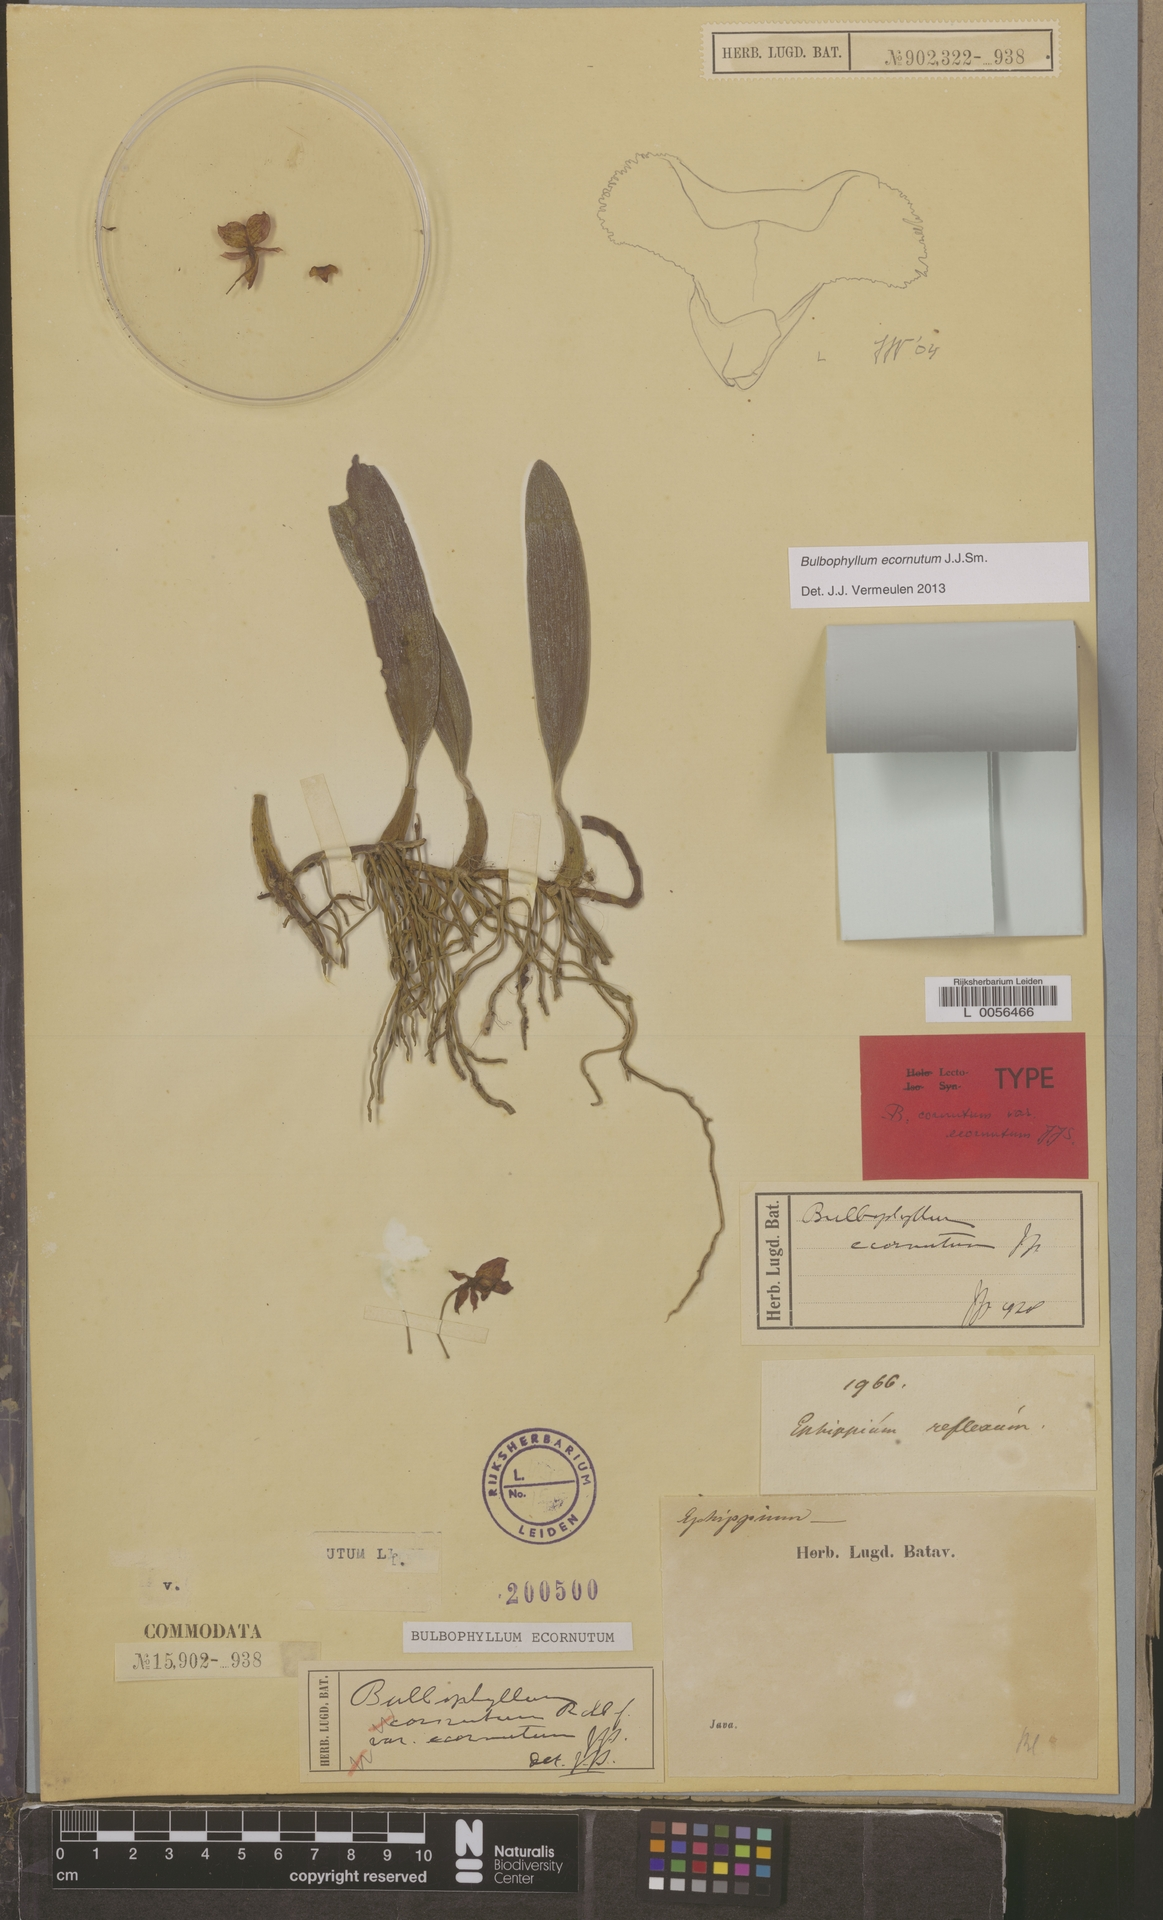 L  0056466 | Bulbophyllum ecornutum (J.J.Sm.) J.J.Sm.